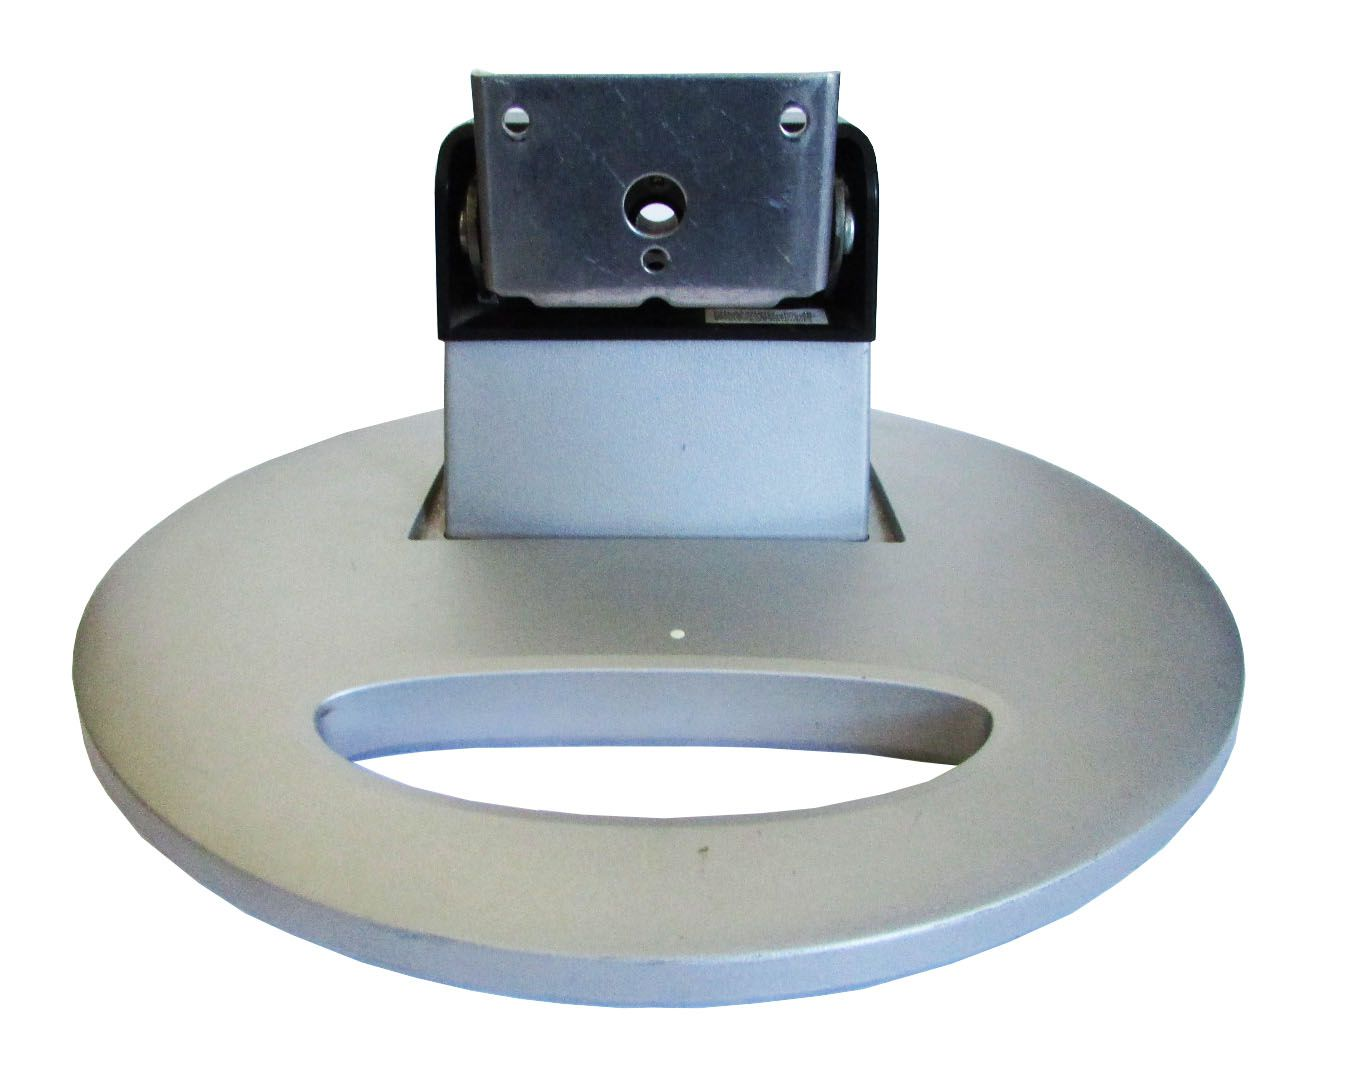 Base de Monitor LG E115797 P/N: A34G0114 (semi novo)